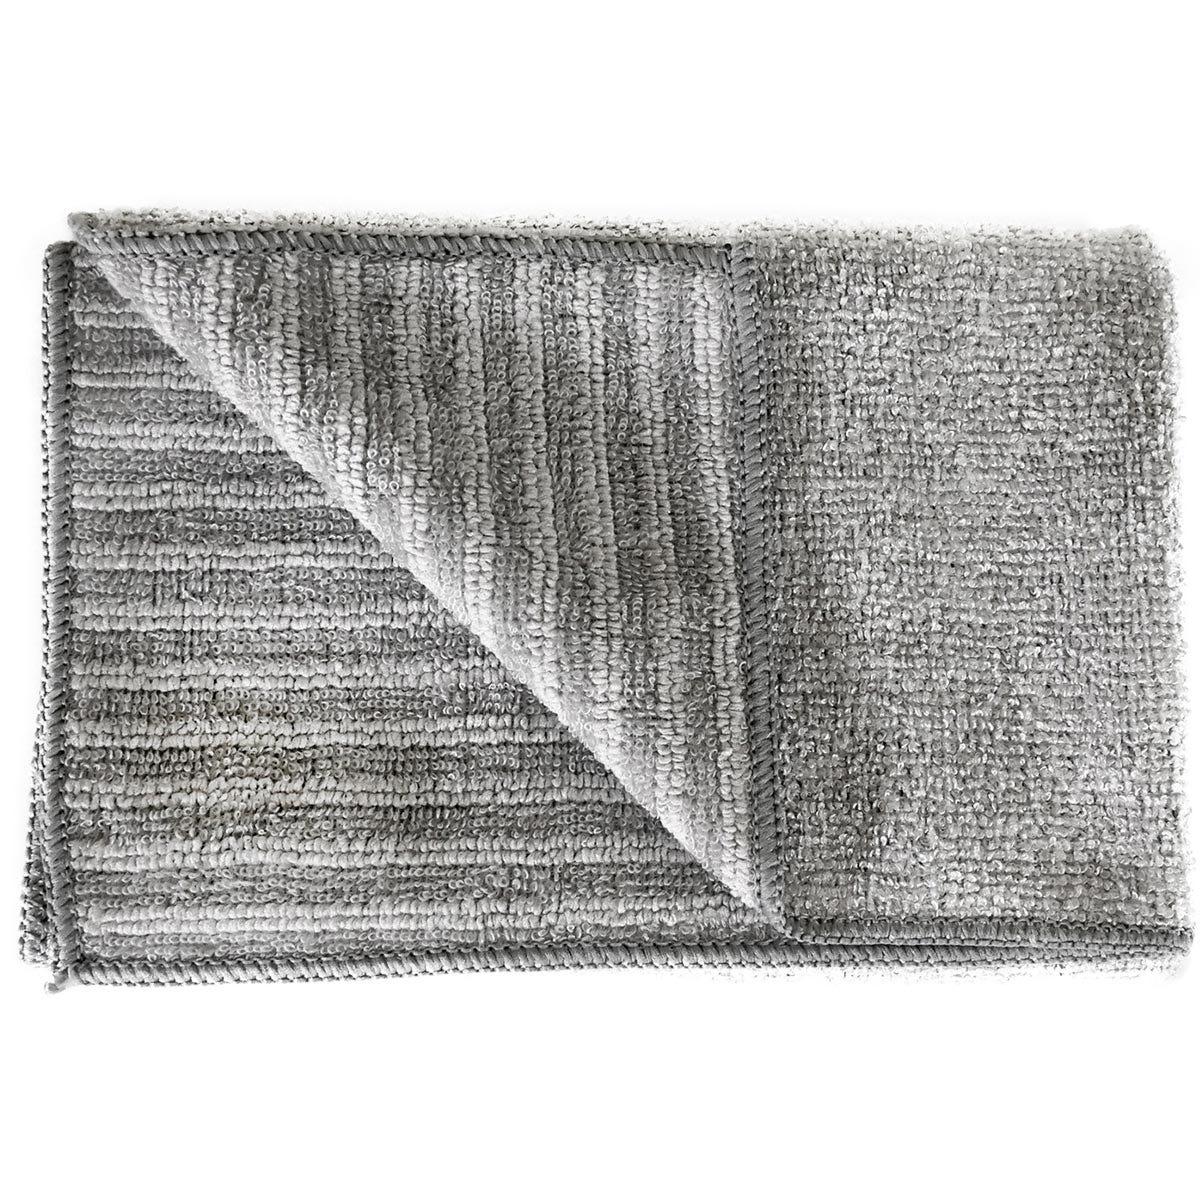 https://googone.com/media/catalog/product/w/e/weiman-microfiber-cloth-for-stainless-steel_fold_3.jpg